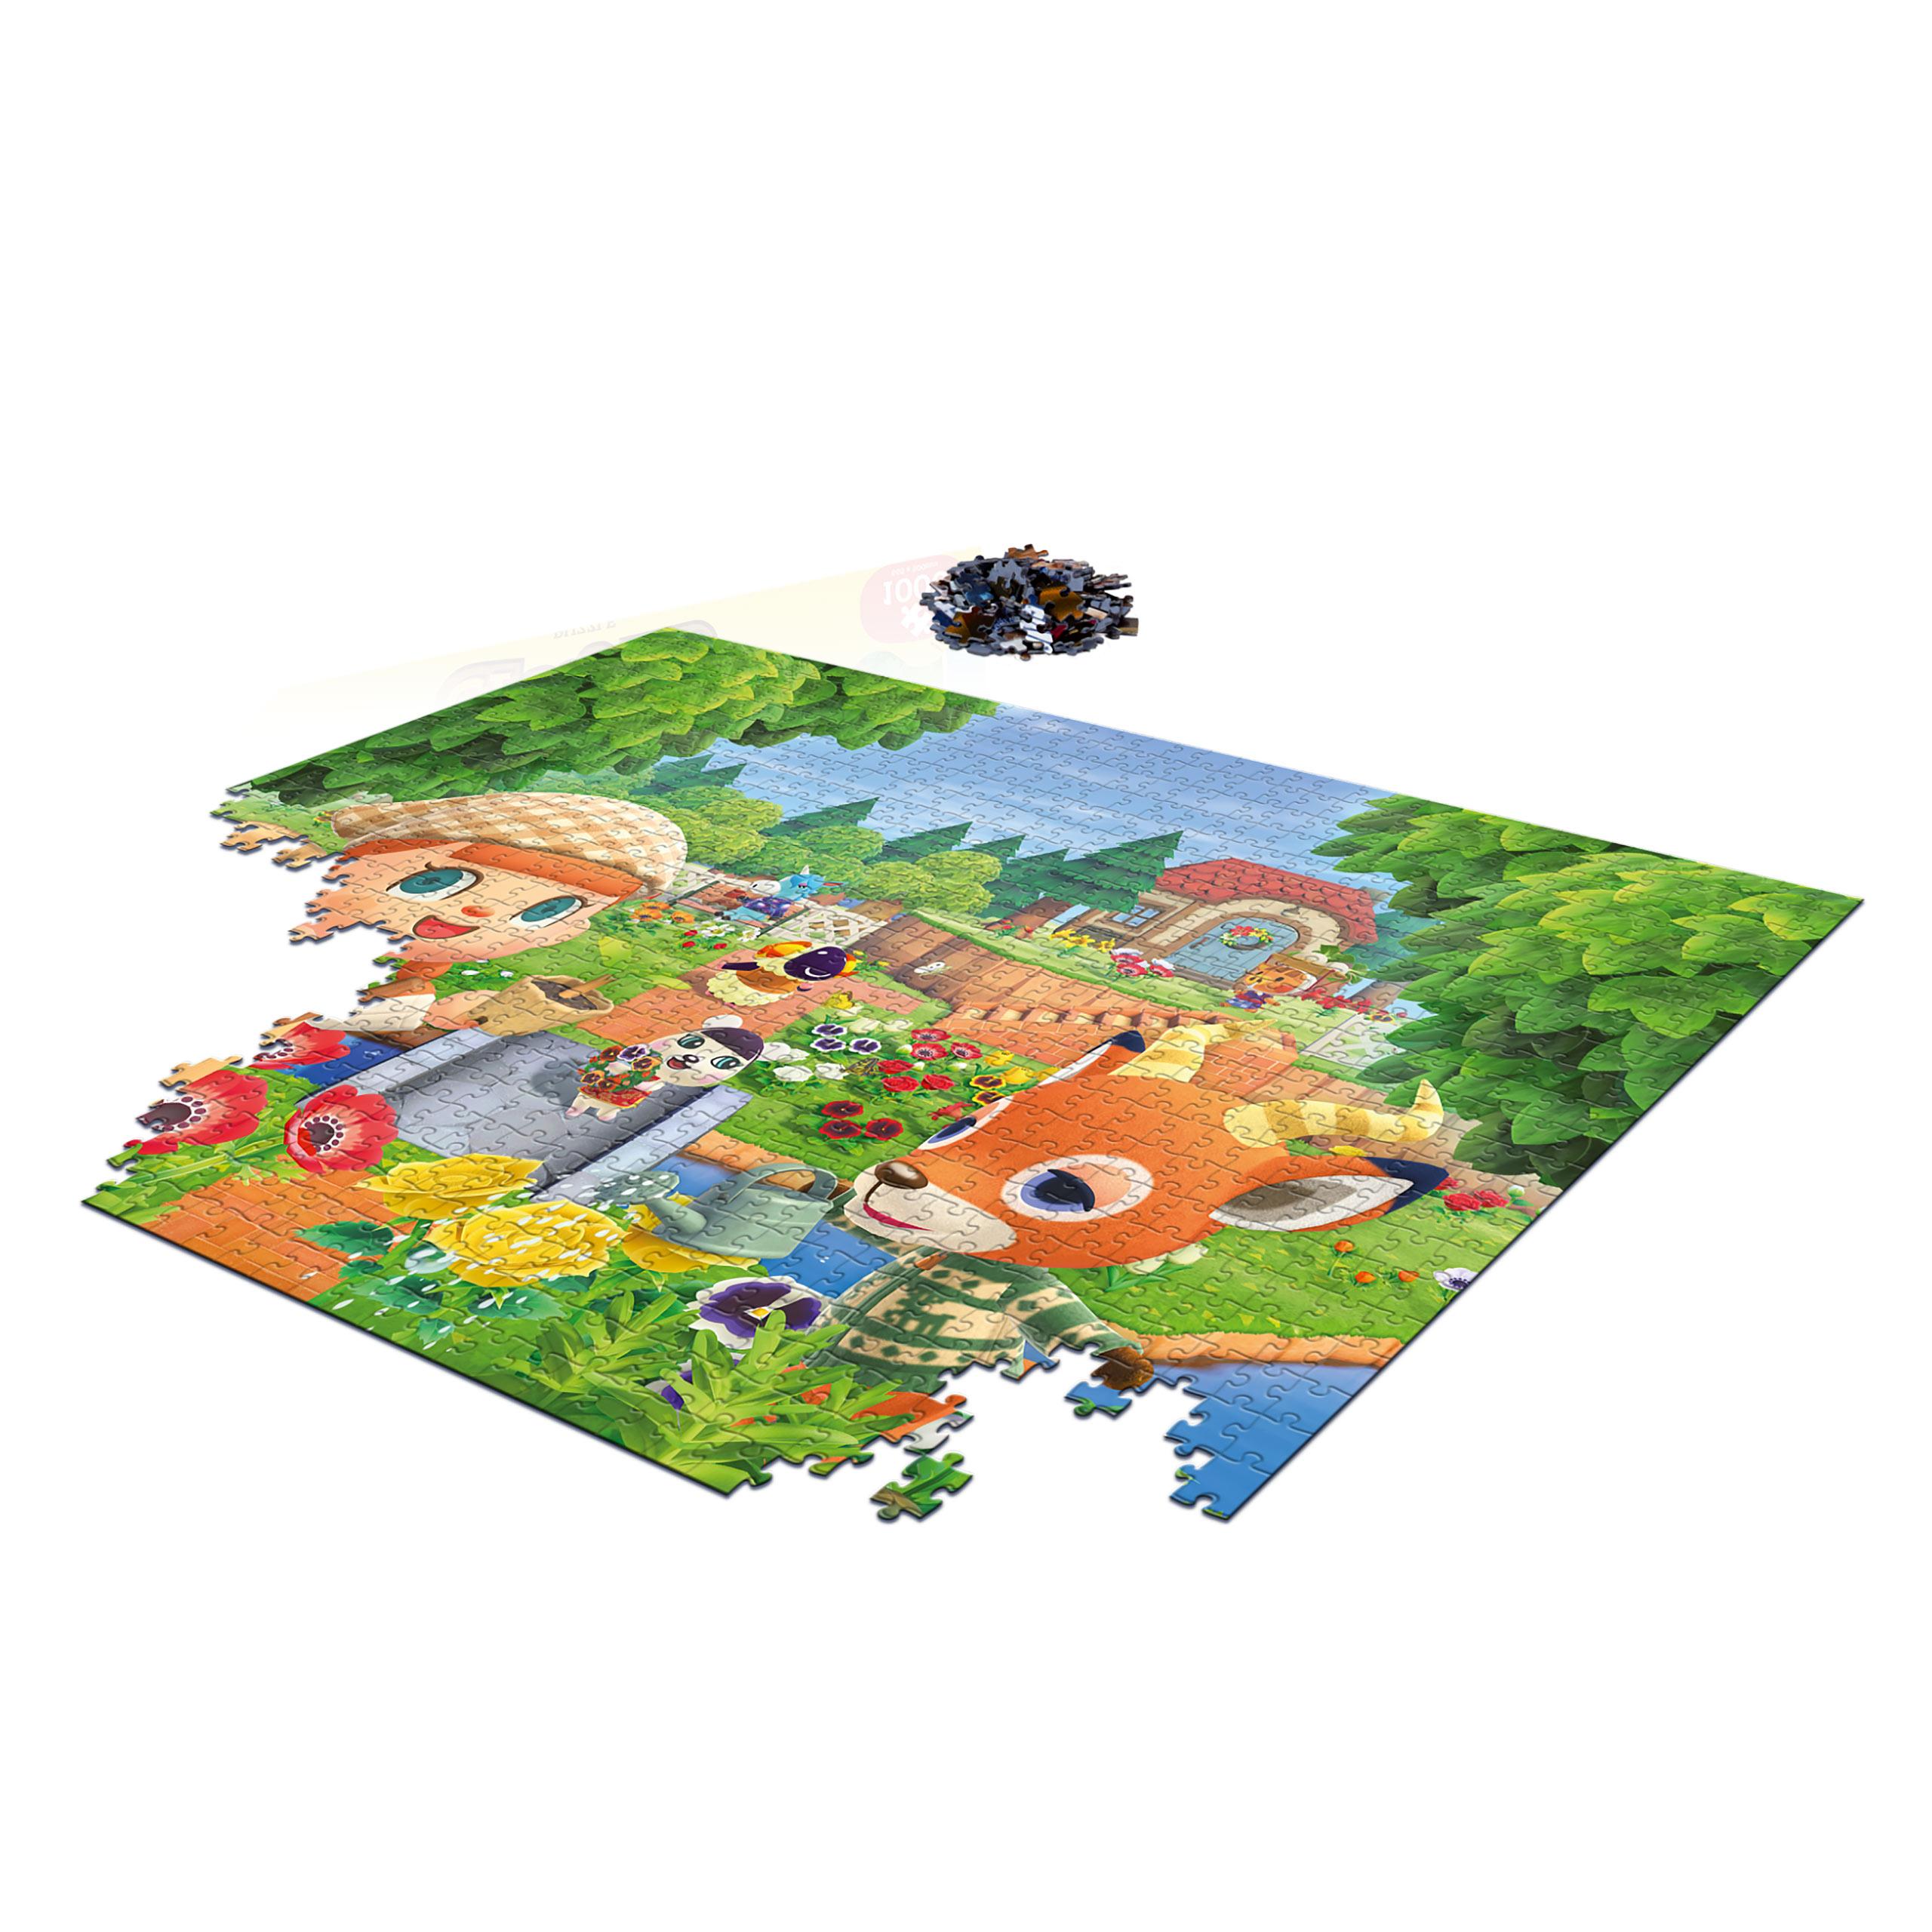 Animal Crossing - New Horizons Puzzle